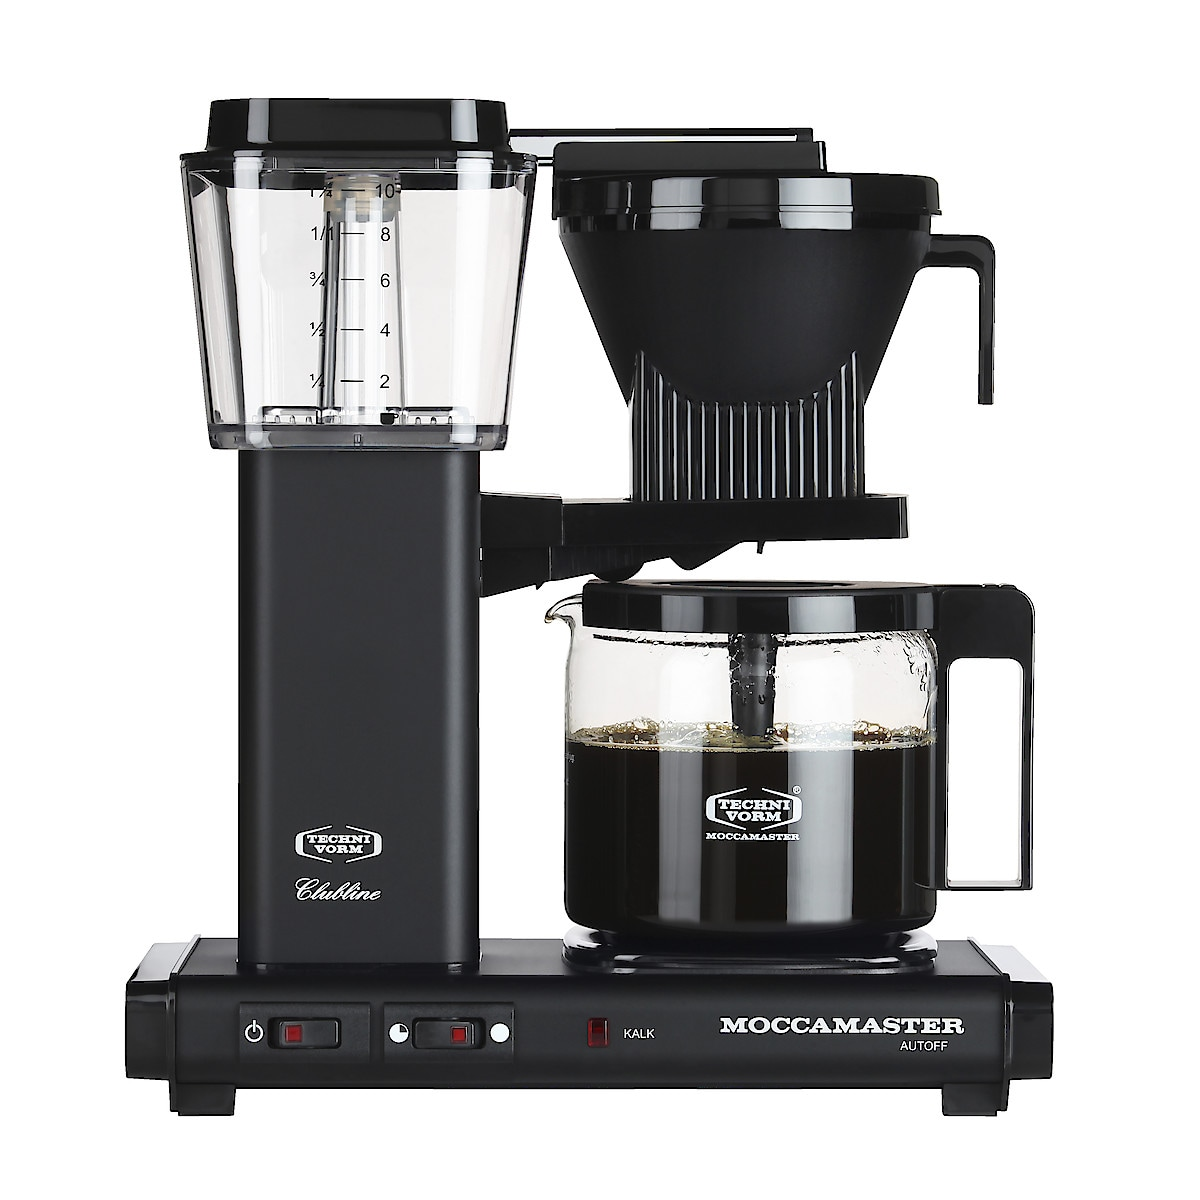 Moccamaster Clubline KBGC982AO kaffebryggare